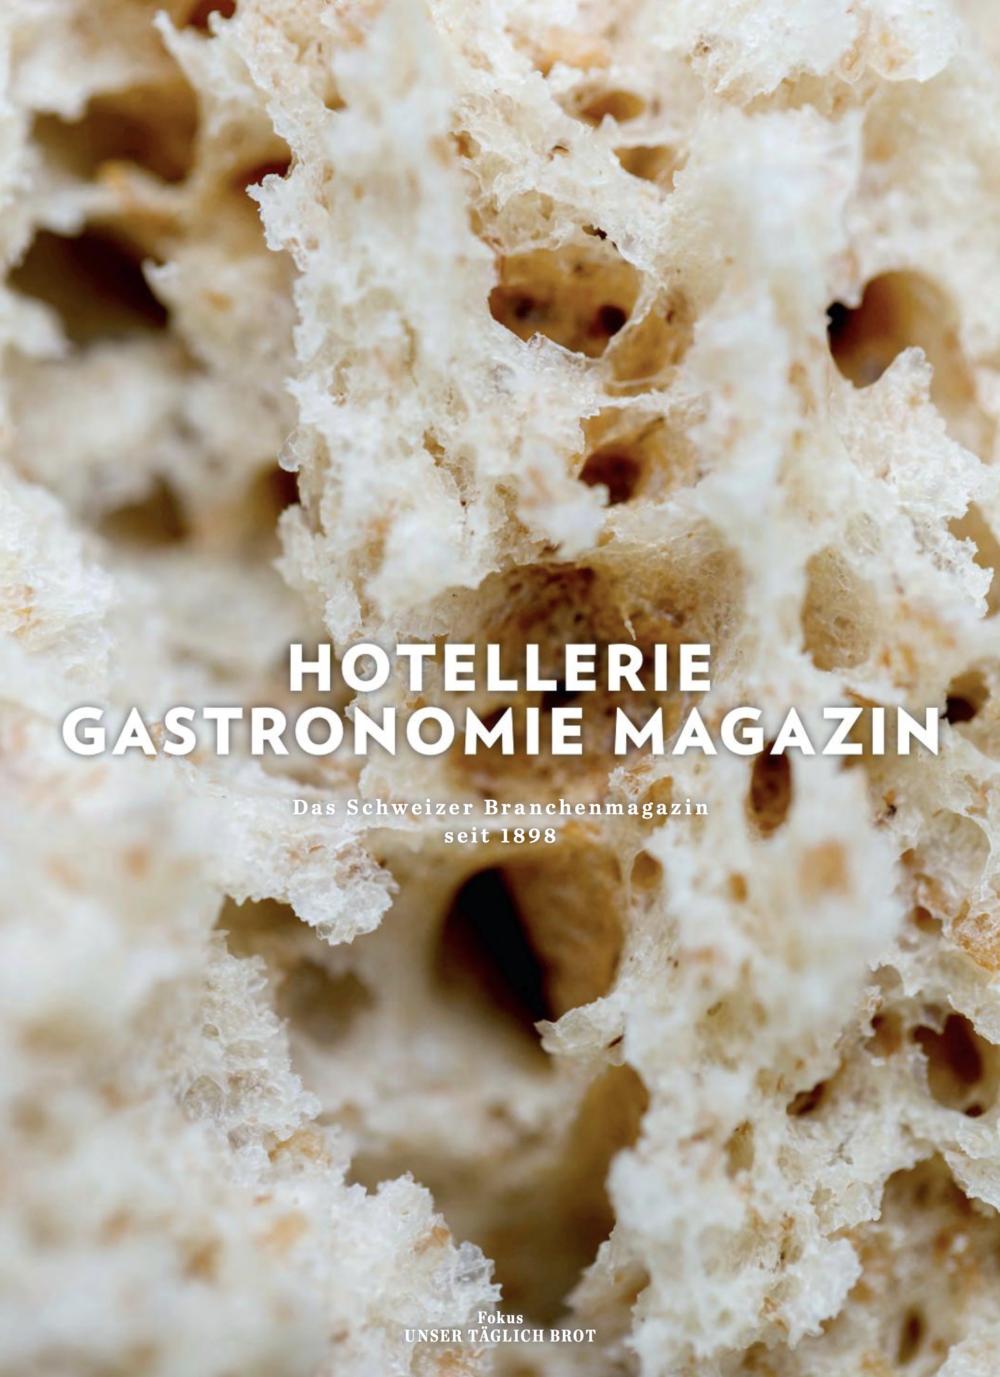 Juni 2017, Hotellerie Gastronomie MG    Locker vom Hocker